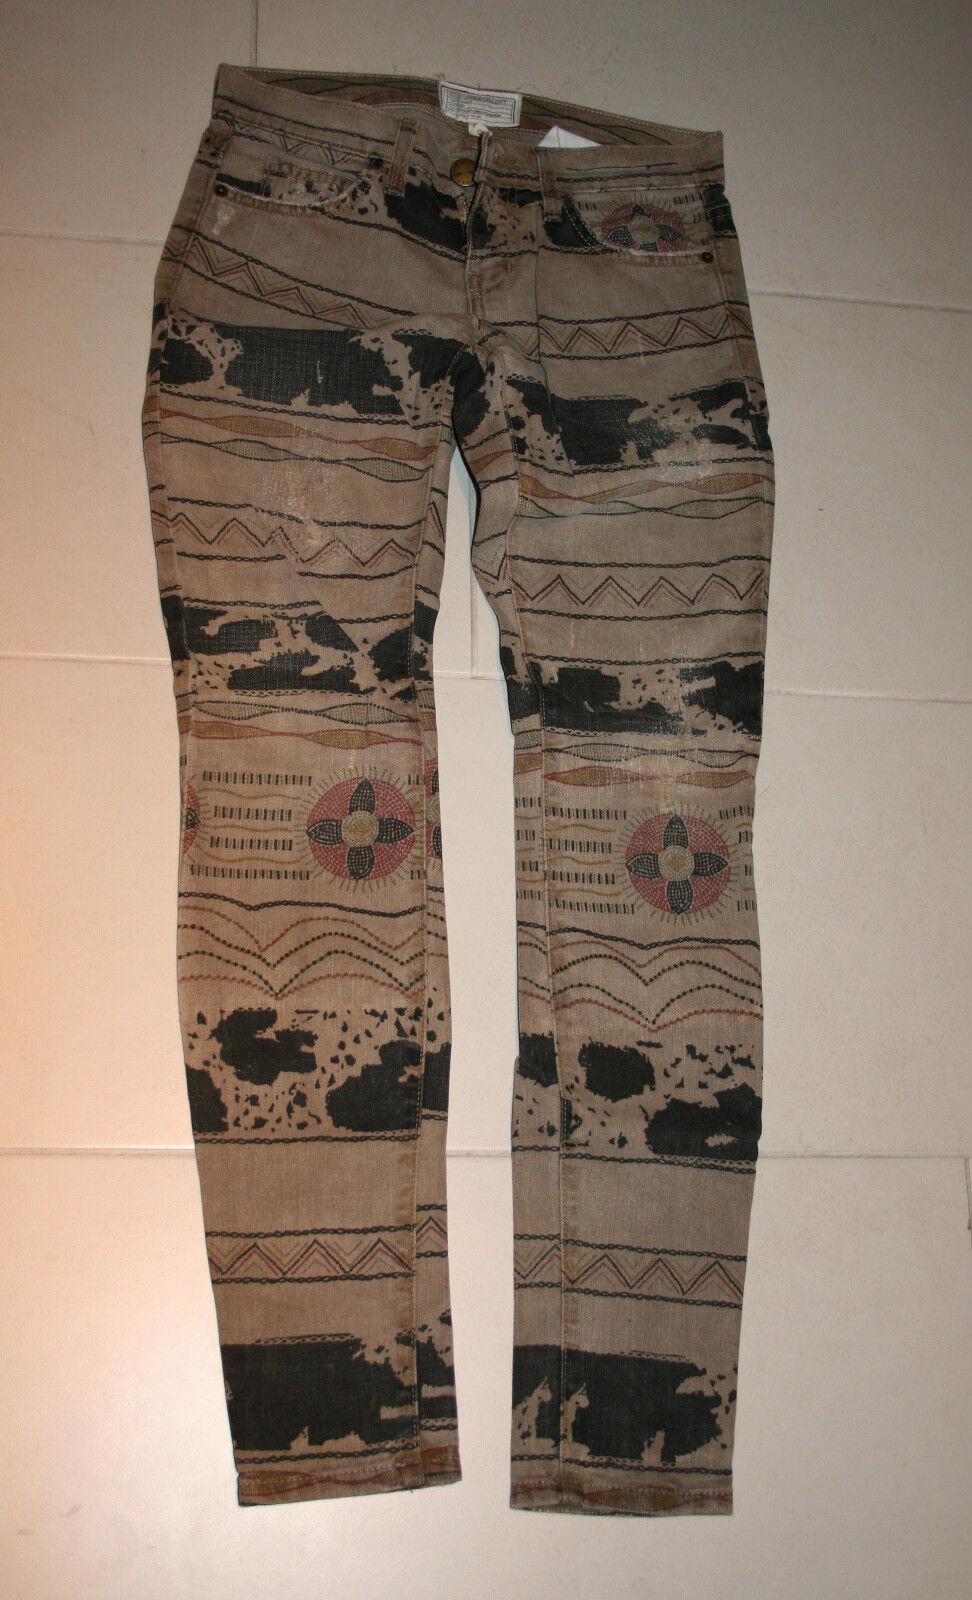 Current Elliott Jeans Gr.24 Beige Grau Muster Print SOLD OUT NP  SKINNY LEG